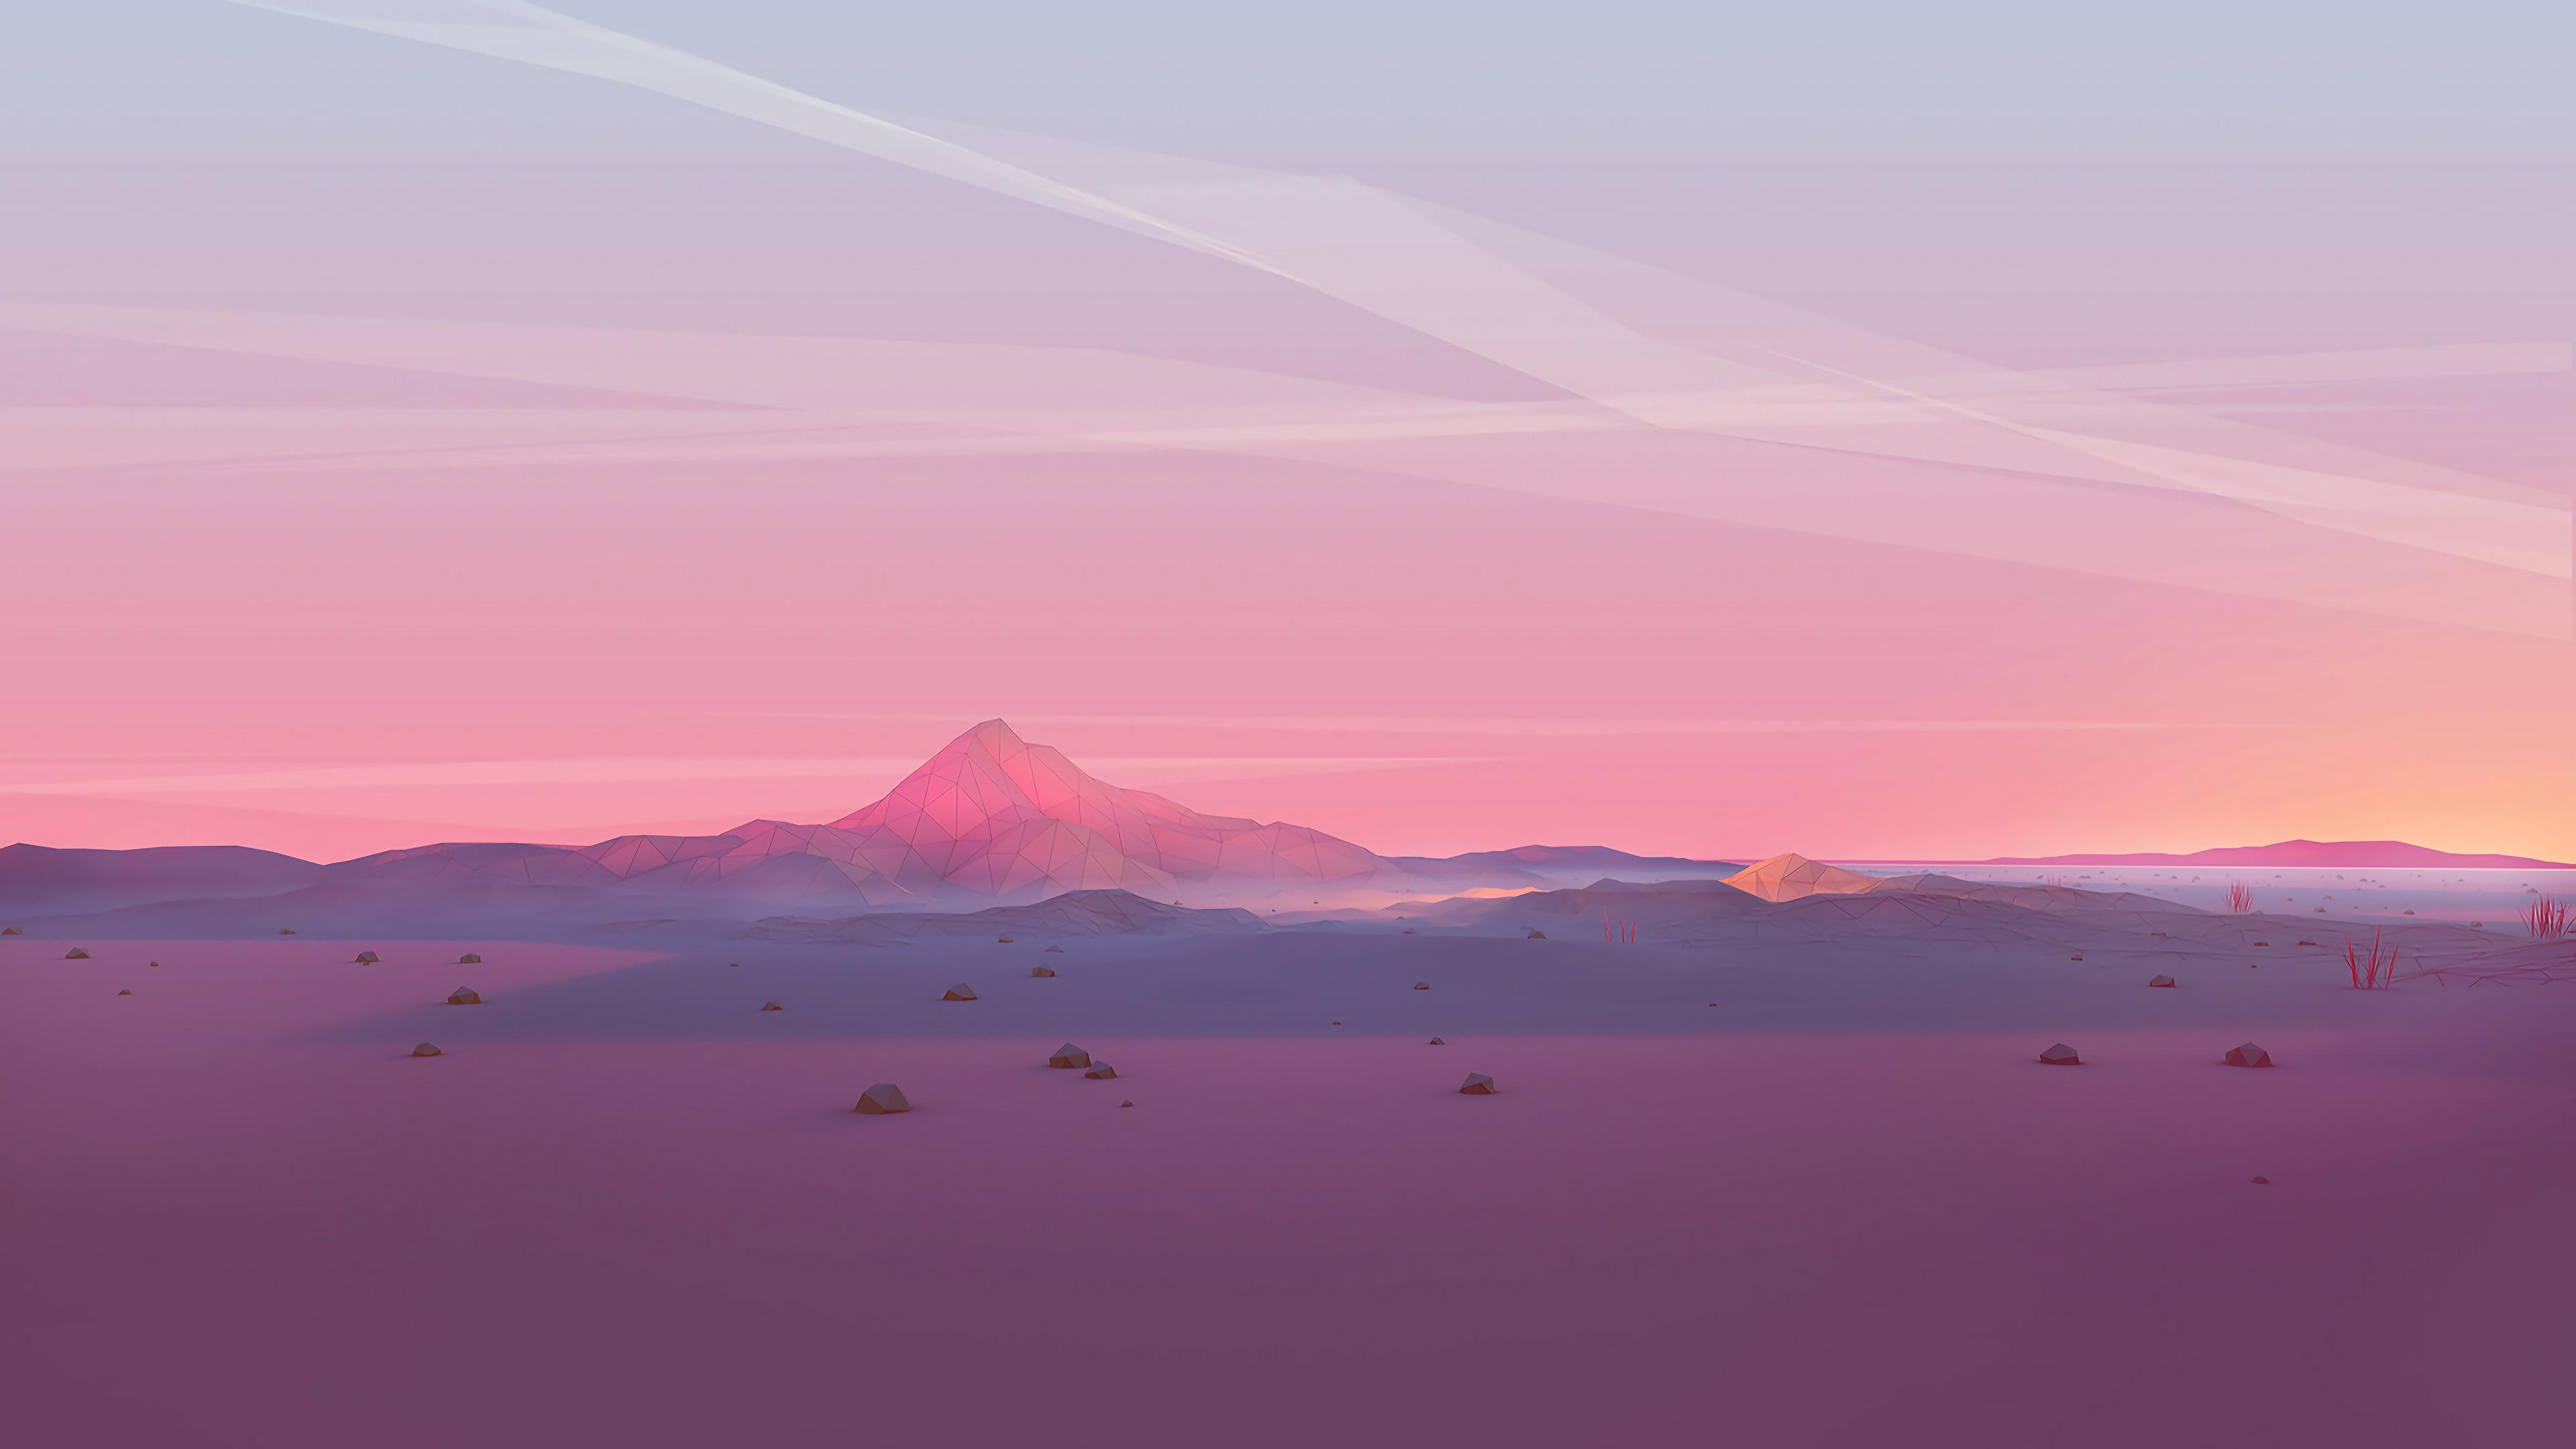 Amazing Wallpaper Mountain Polygon - mountains-grids-polygon-4k-a9  Image_416452.jpg